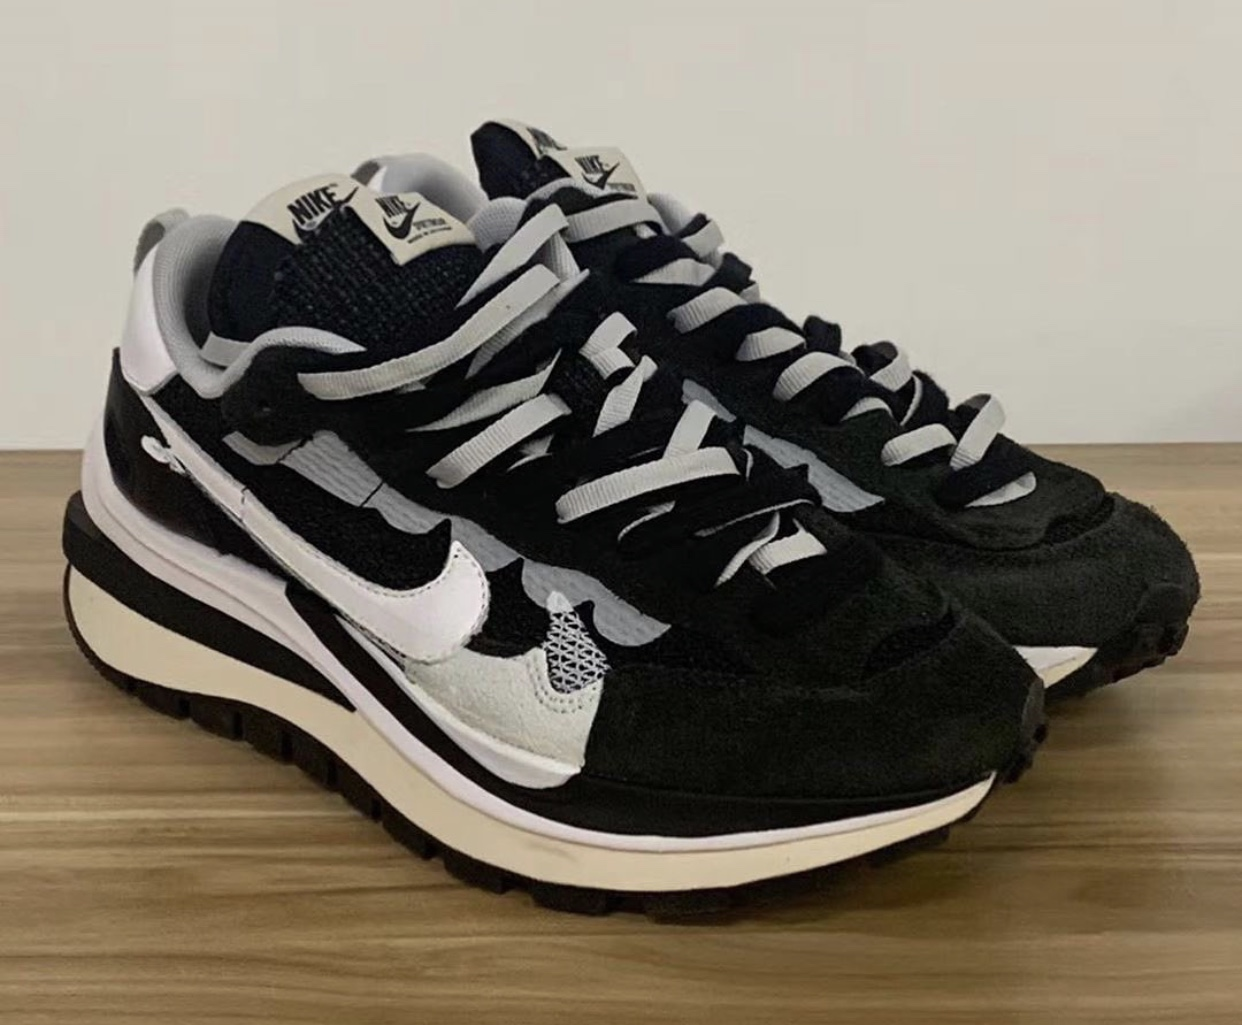 Sacai Nike VaporWaffle Black White Platinum CV1363-001 Release Date